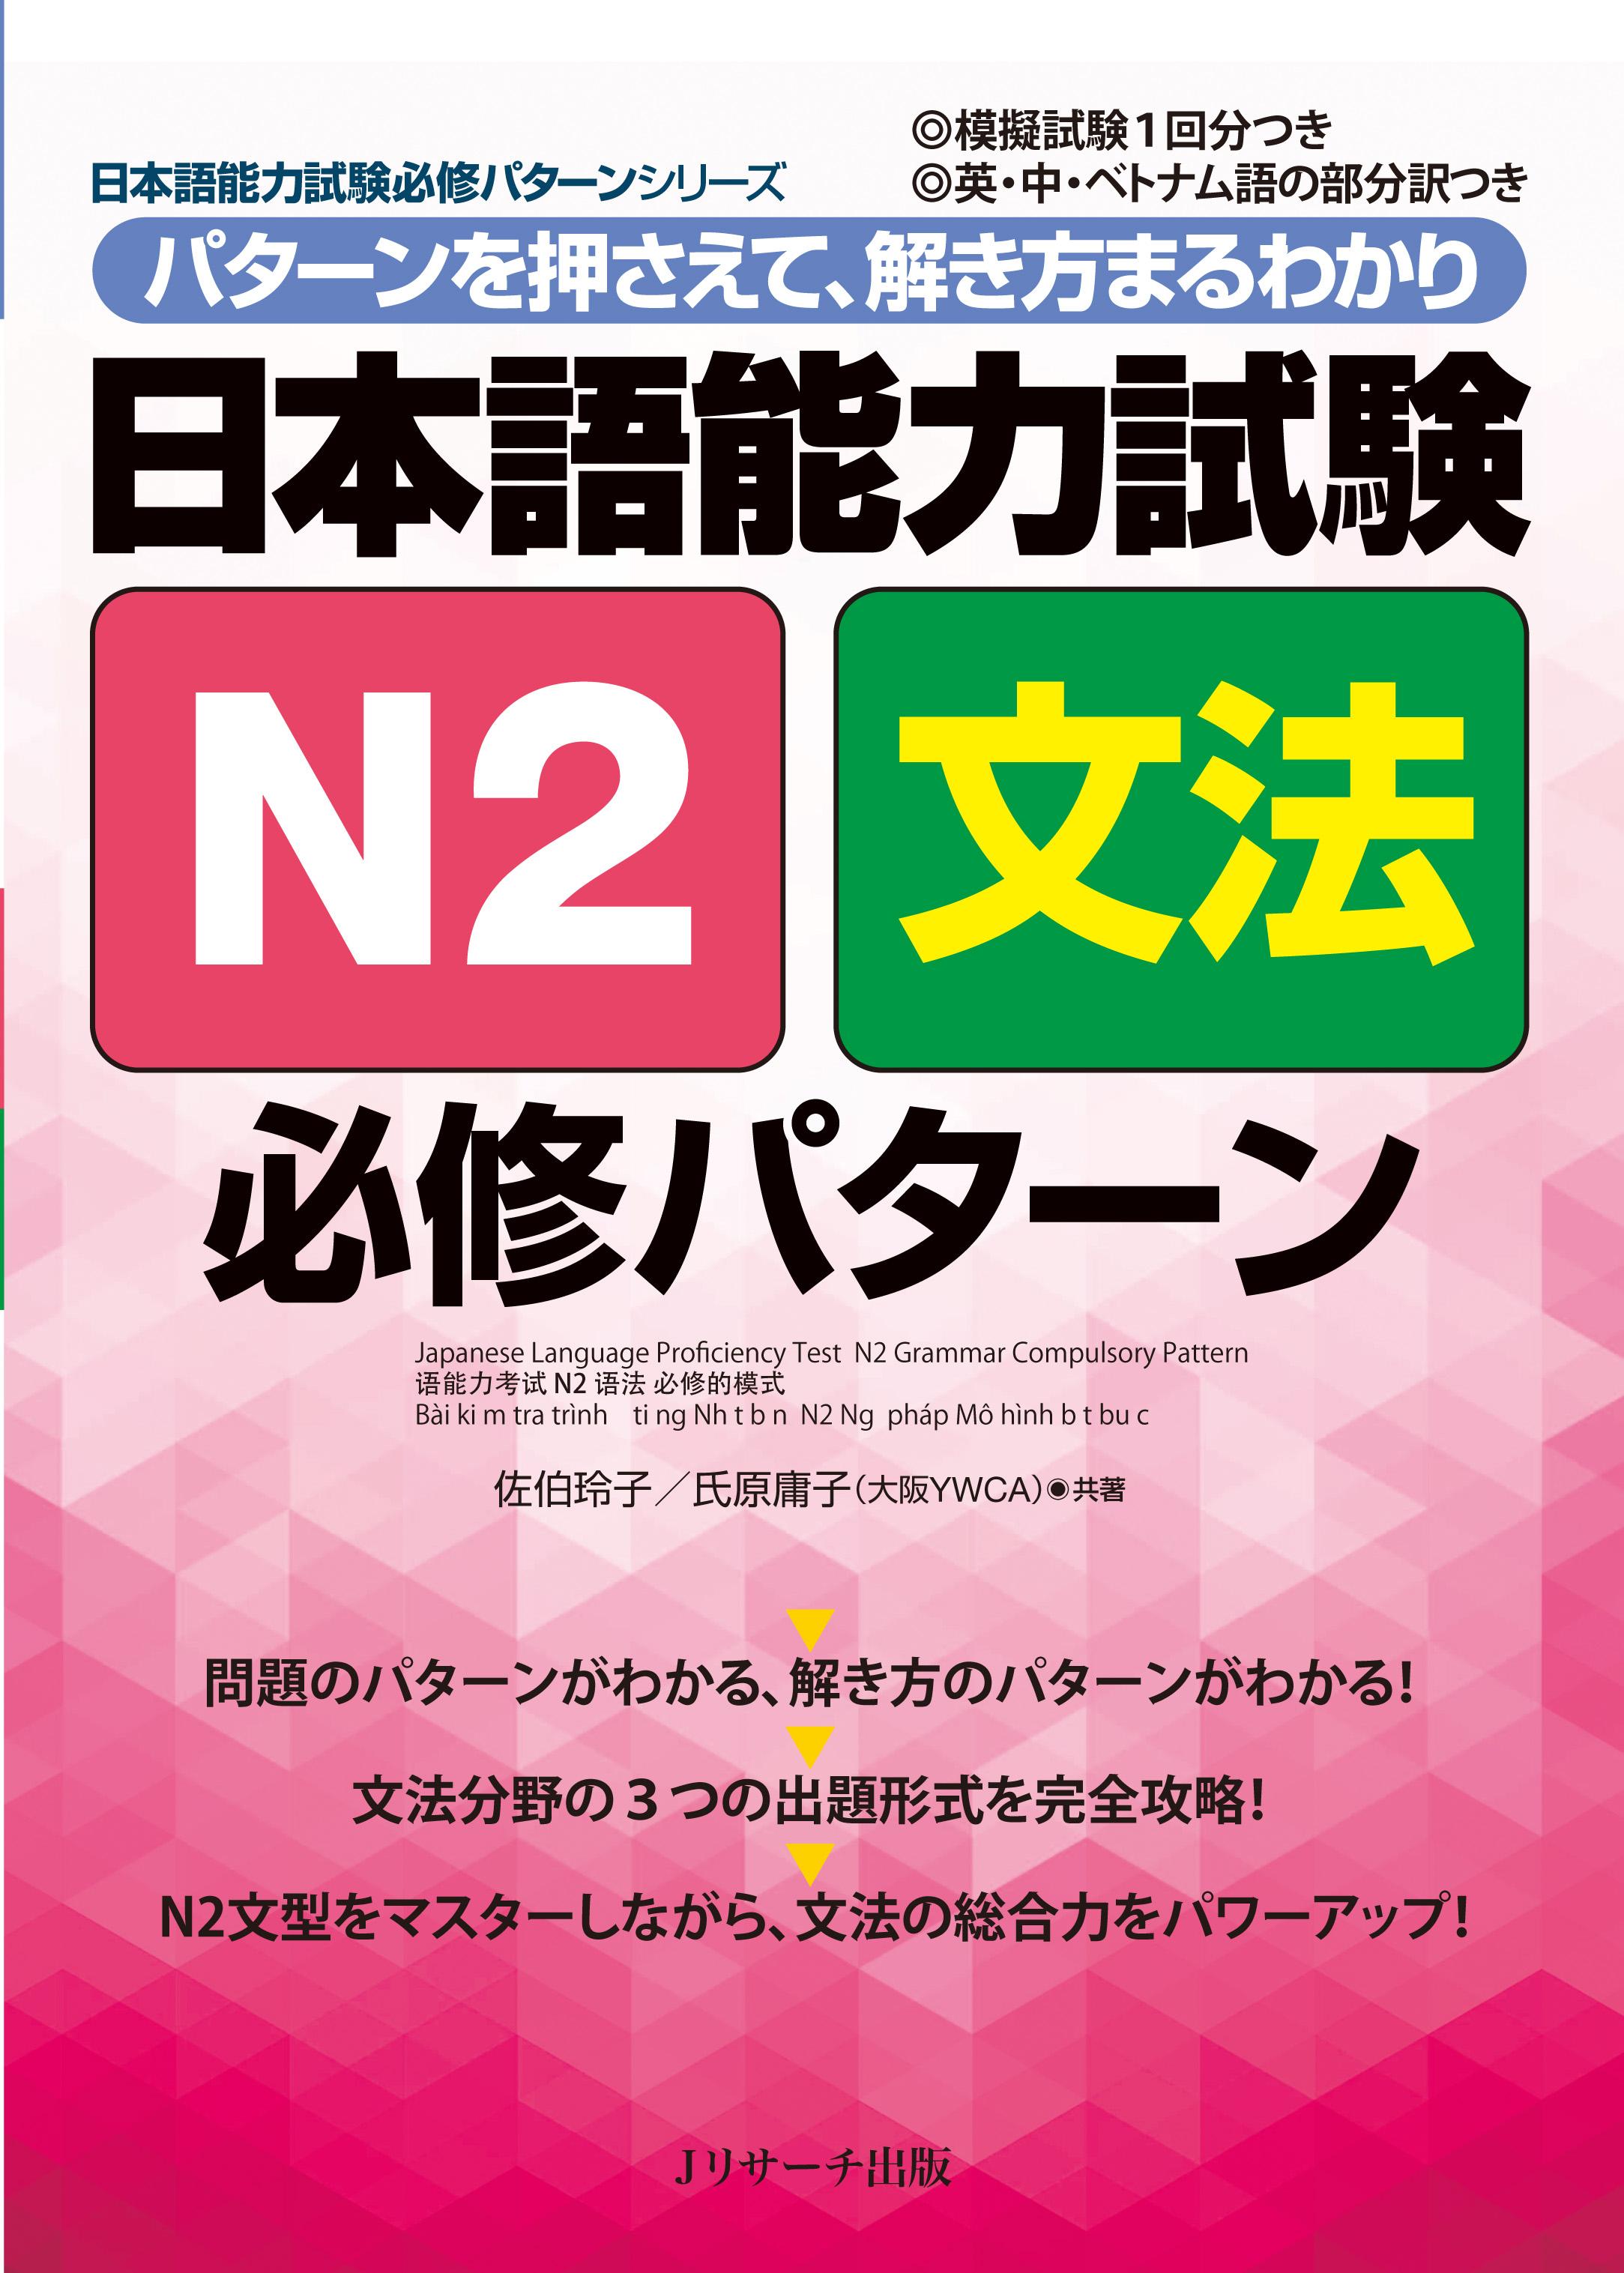 日本語能力試験 N2文法 必修パターン画像